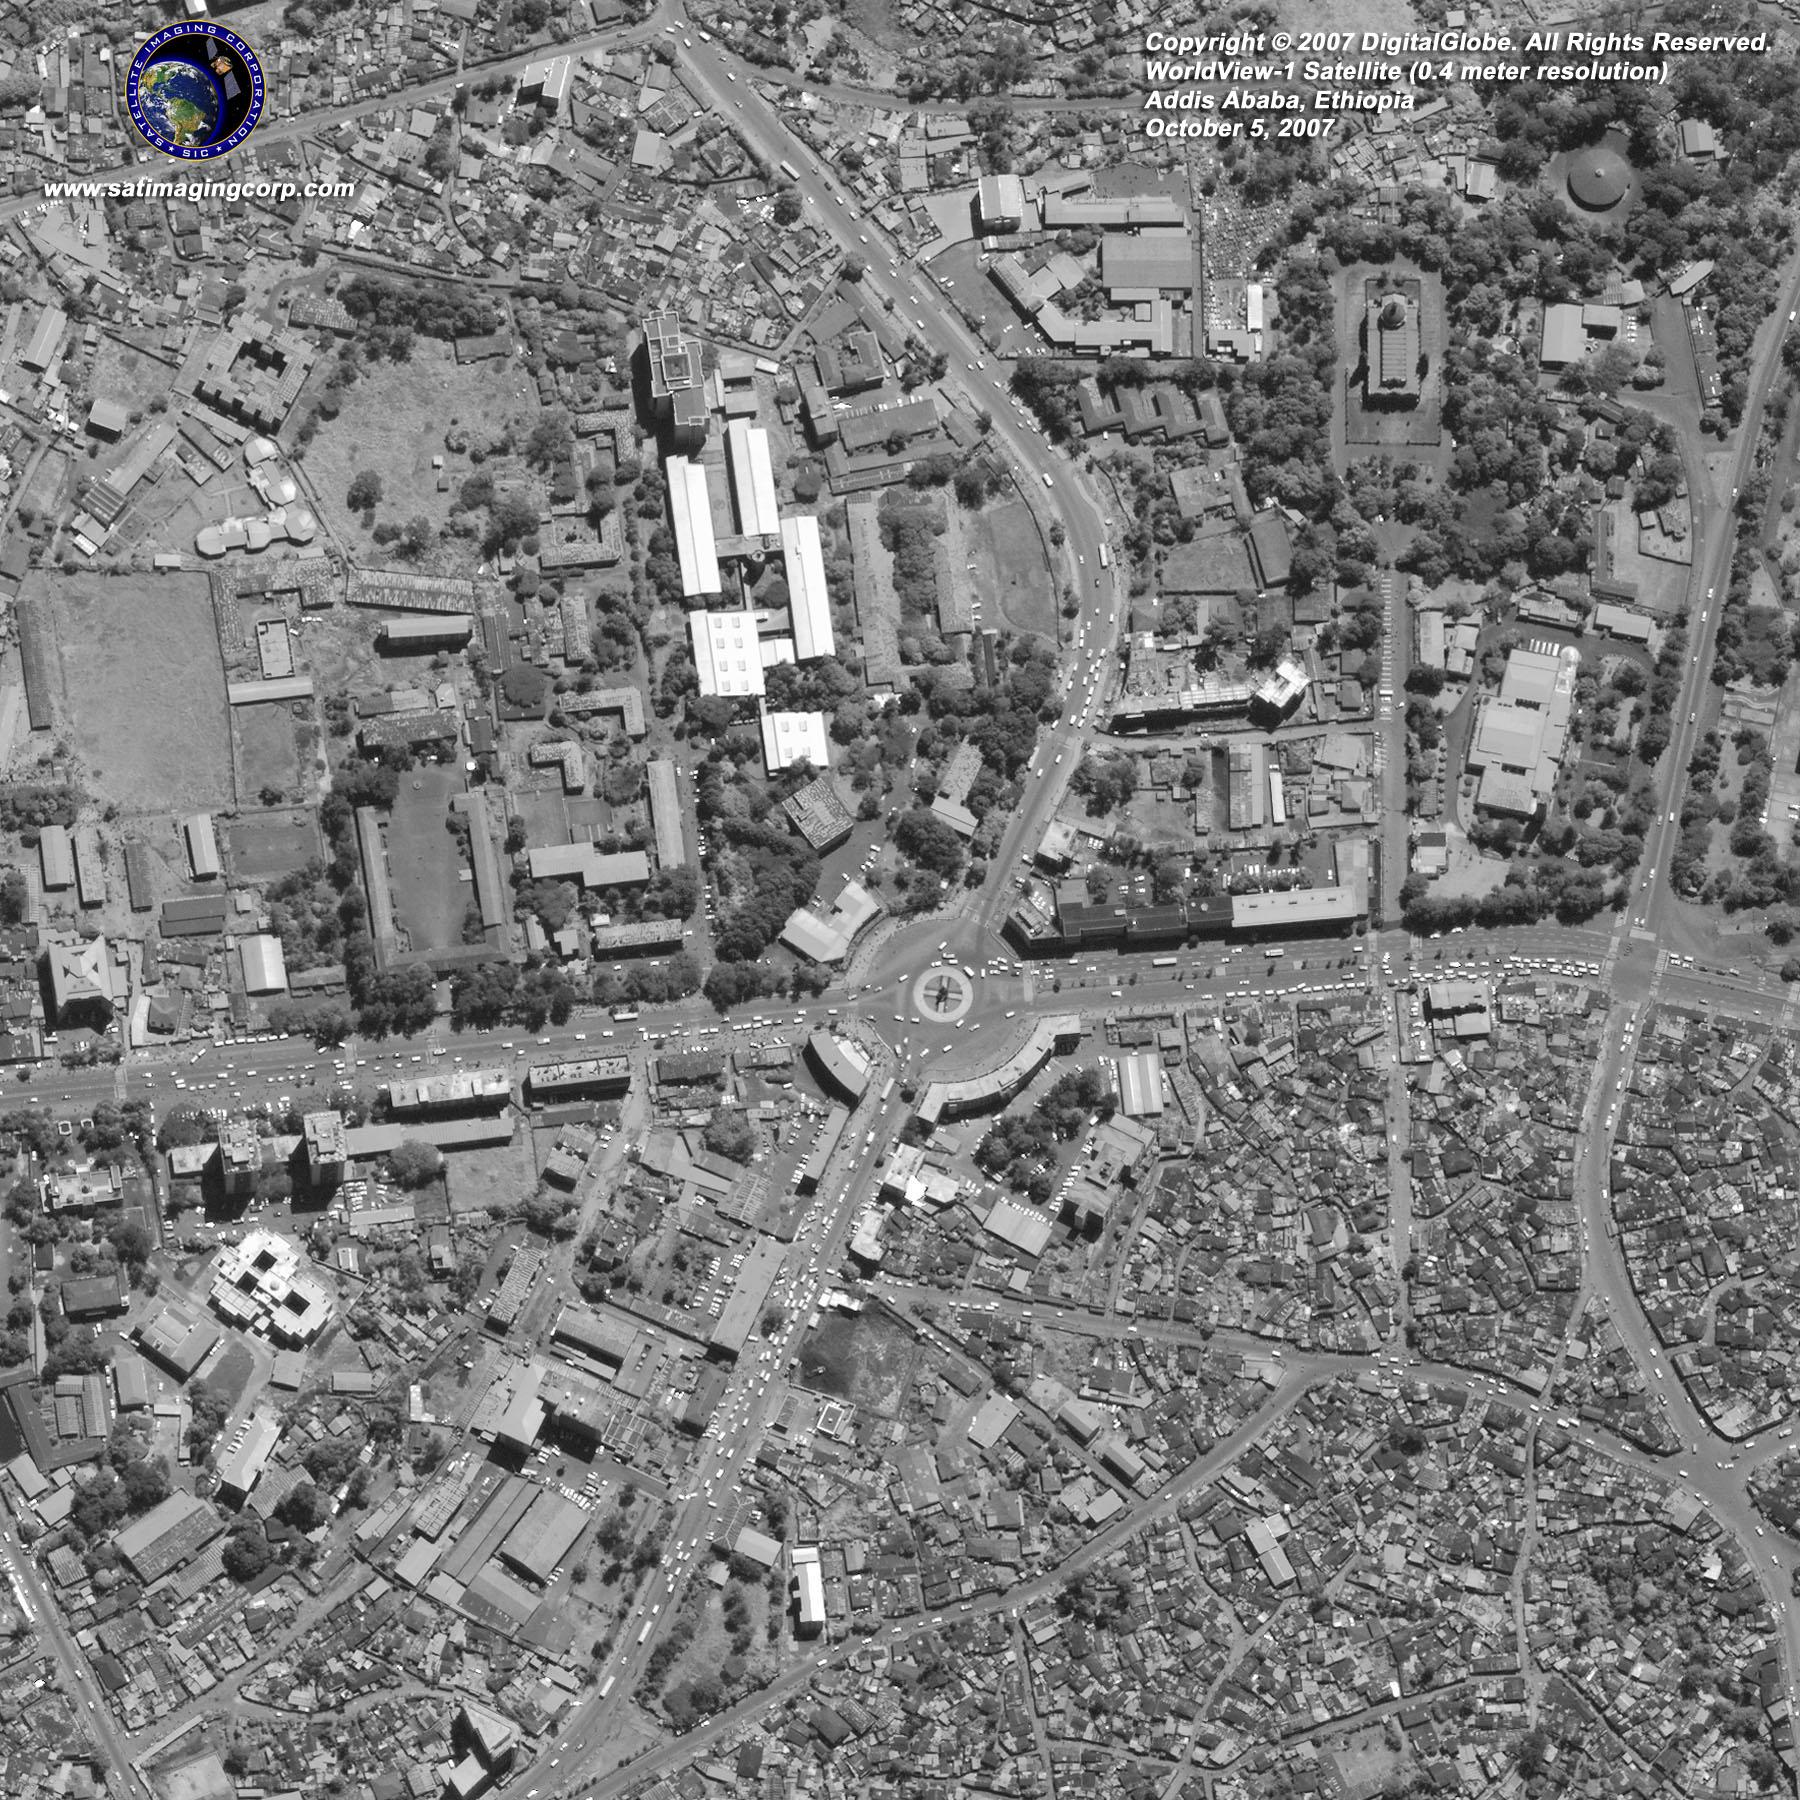 WorldView-1 Satellite Image Addis Ababa, Ethiopia ... on food of ethiopia, satellite map kenya, elevation of ethiopia, village of ethiopia, flora of ethiopia, geographic features of ethiopia, coordinates of ethiopia, king of ethiopia, road map ethiopia, native animal in ethiopia, aerial view of ethiopia, sodo ethiopia, national flag of ethiopia, capital of ethiopia, nazret ethiopia, gojjam ethiopia, city of ethiopia, afar region ethiopia, awash ethiopia,